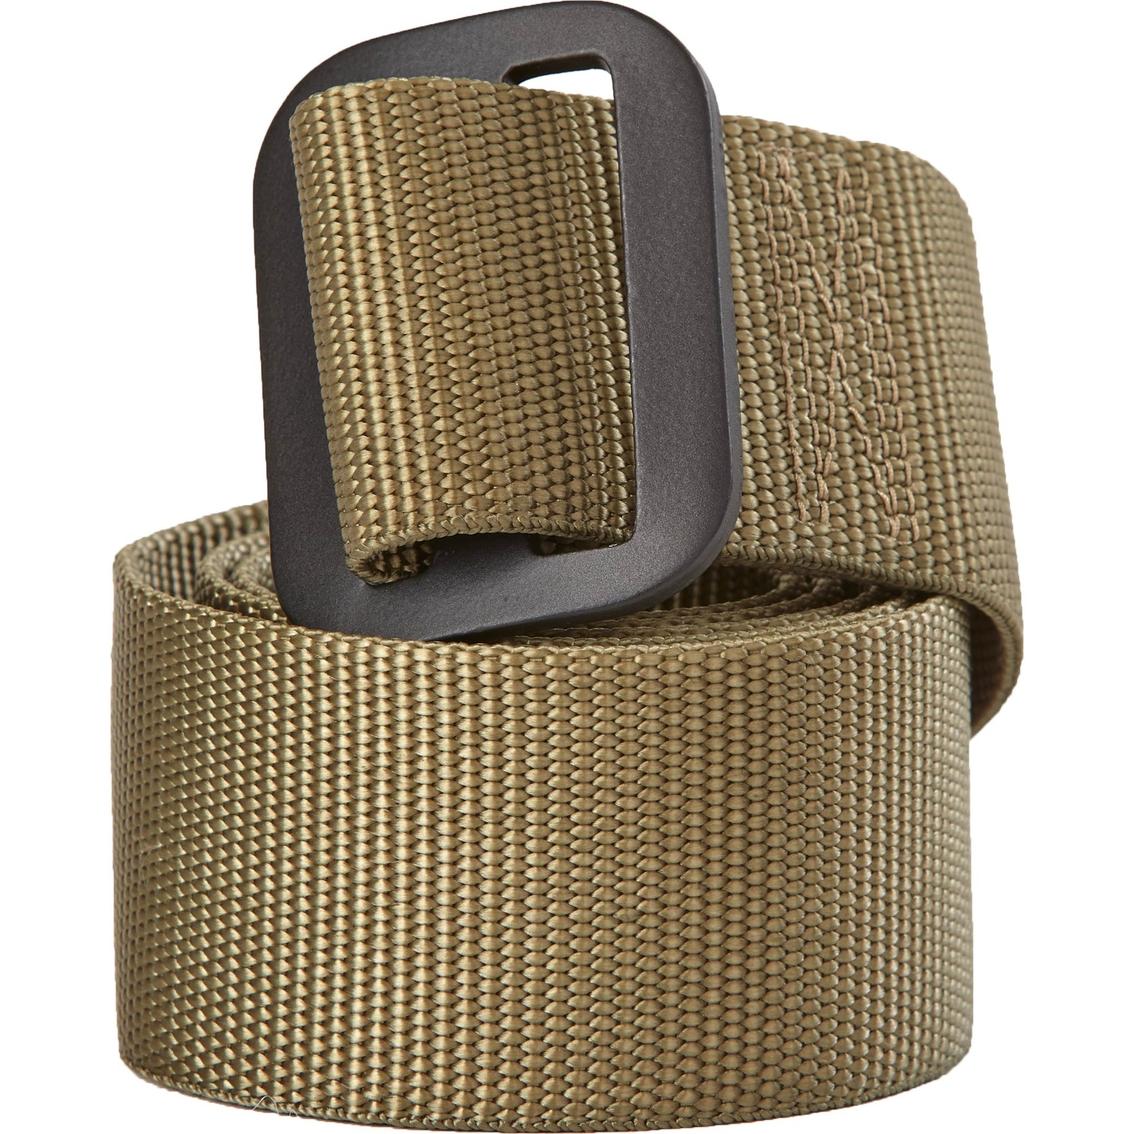 Dlats Army Rigger Belt (ocp) | Ocp-acu | Military | Shop The